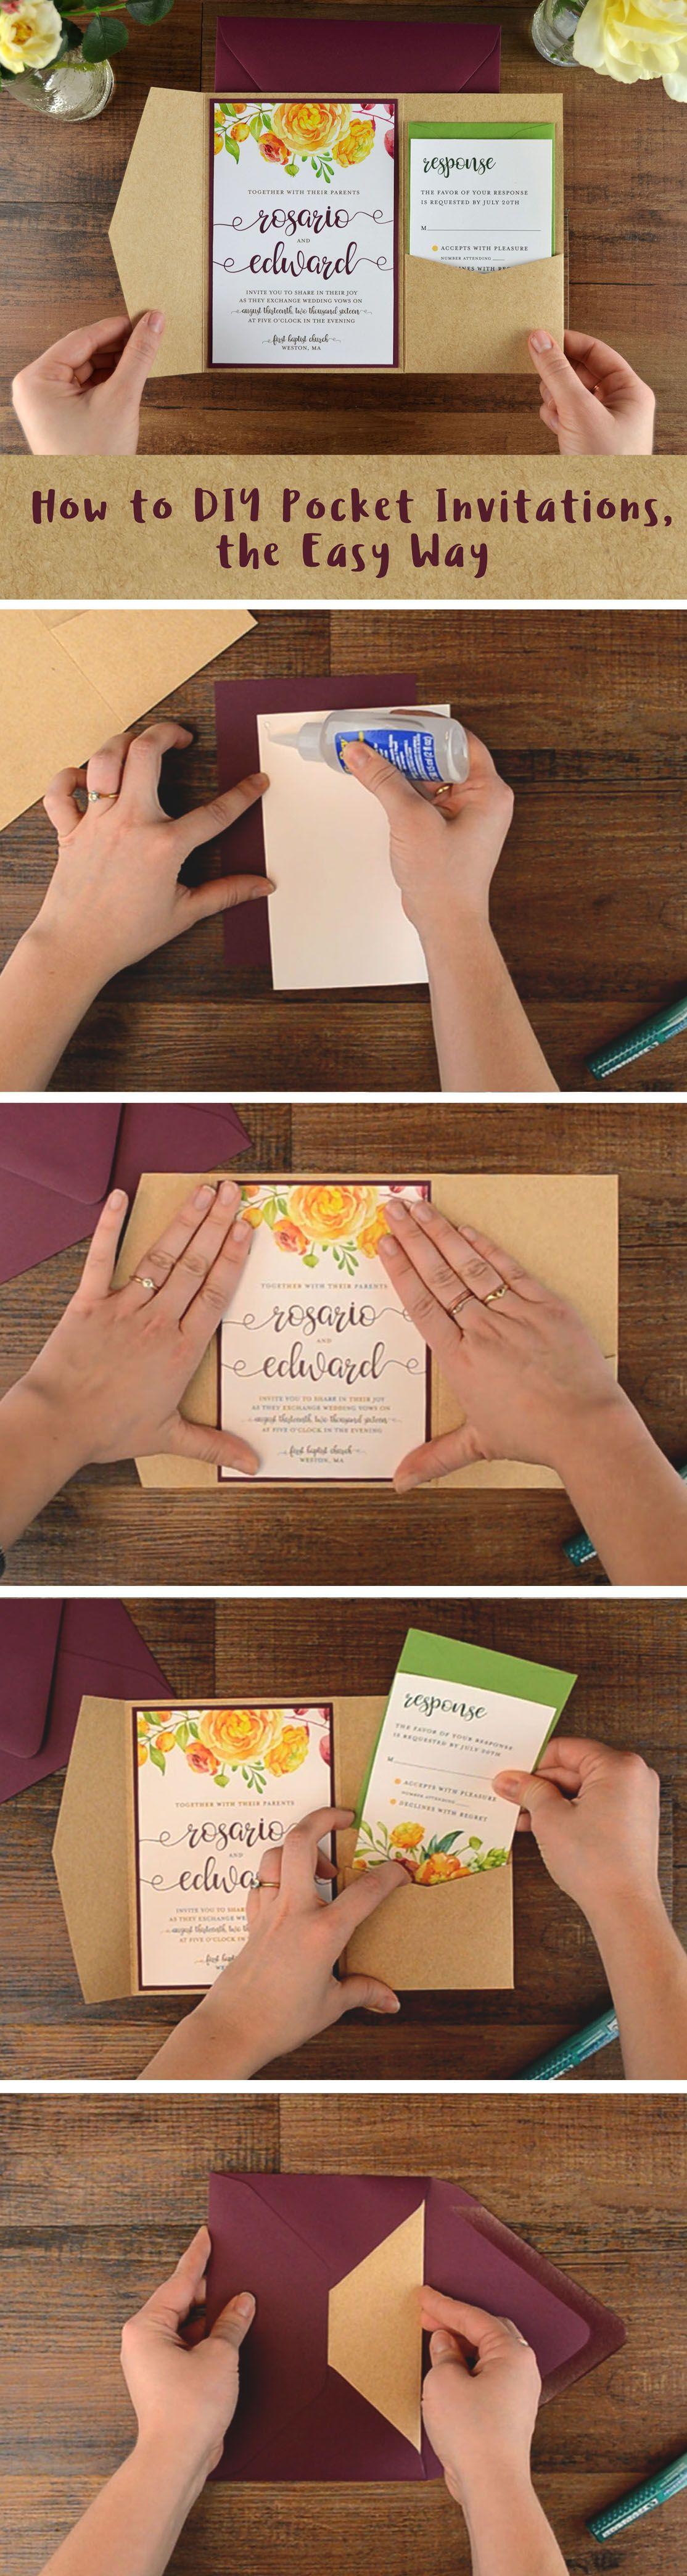 How to diy pocket invitations the easy way free invitation easy diy pocket invitation its easy to create cheap wedding invitations when you diy monicamarmolfo Gallery